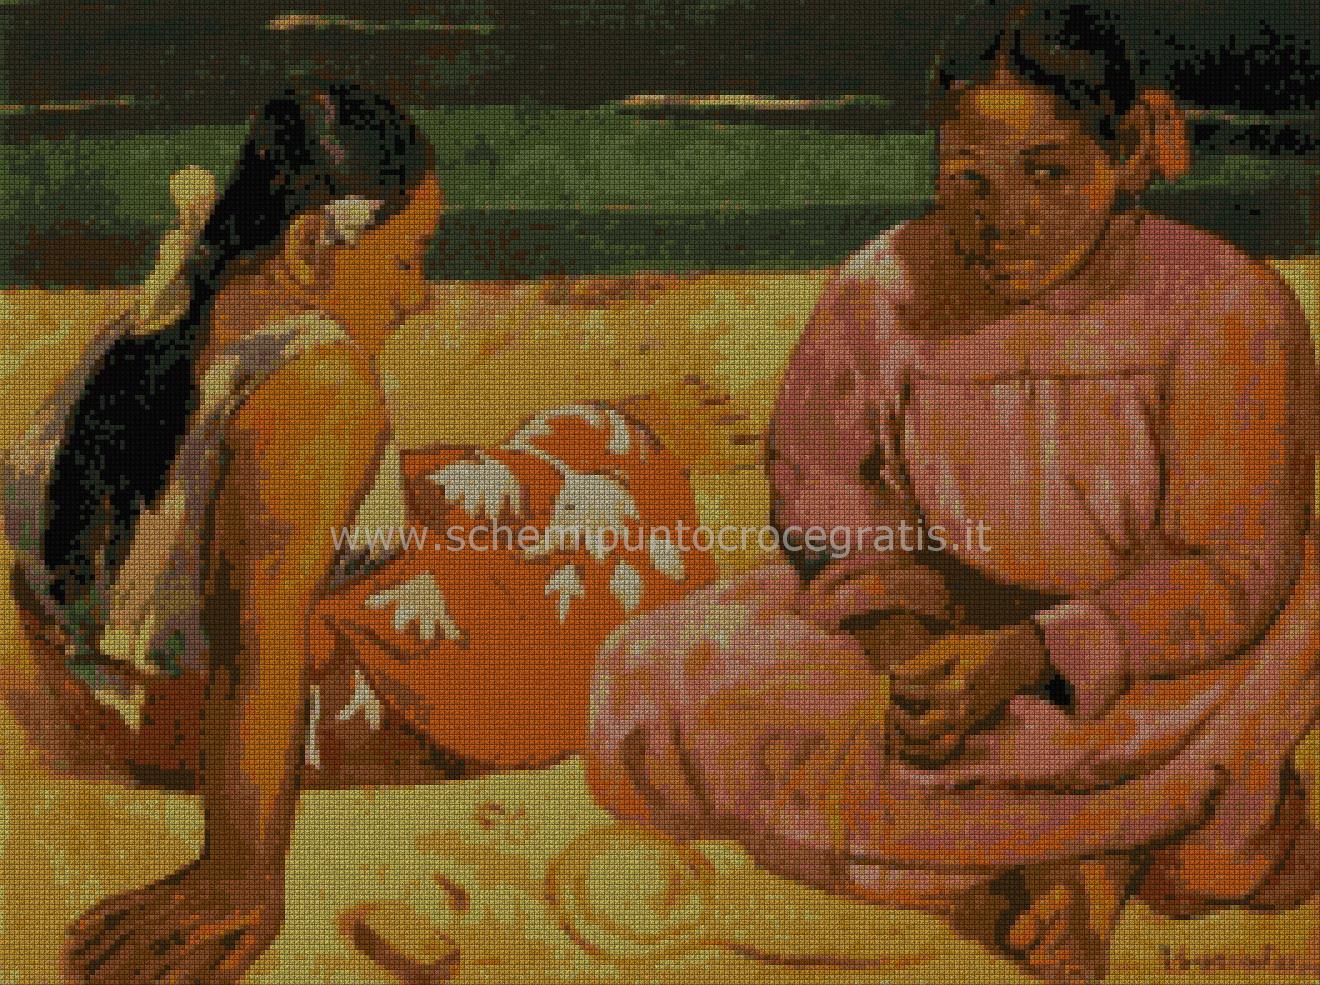 pittori_moderni/gauguin/gauguin01.jpg